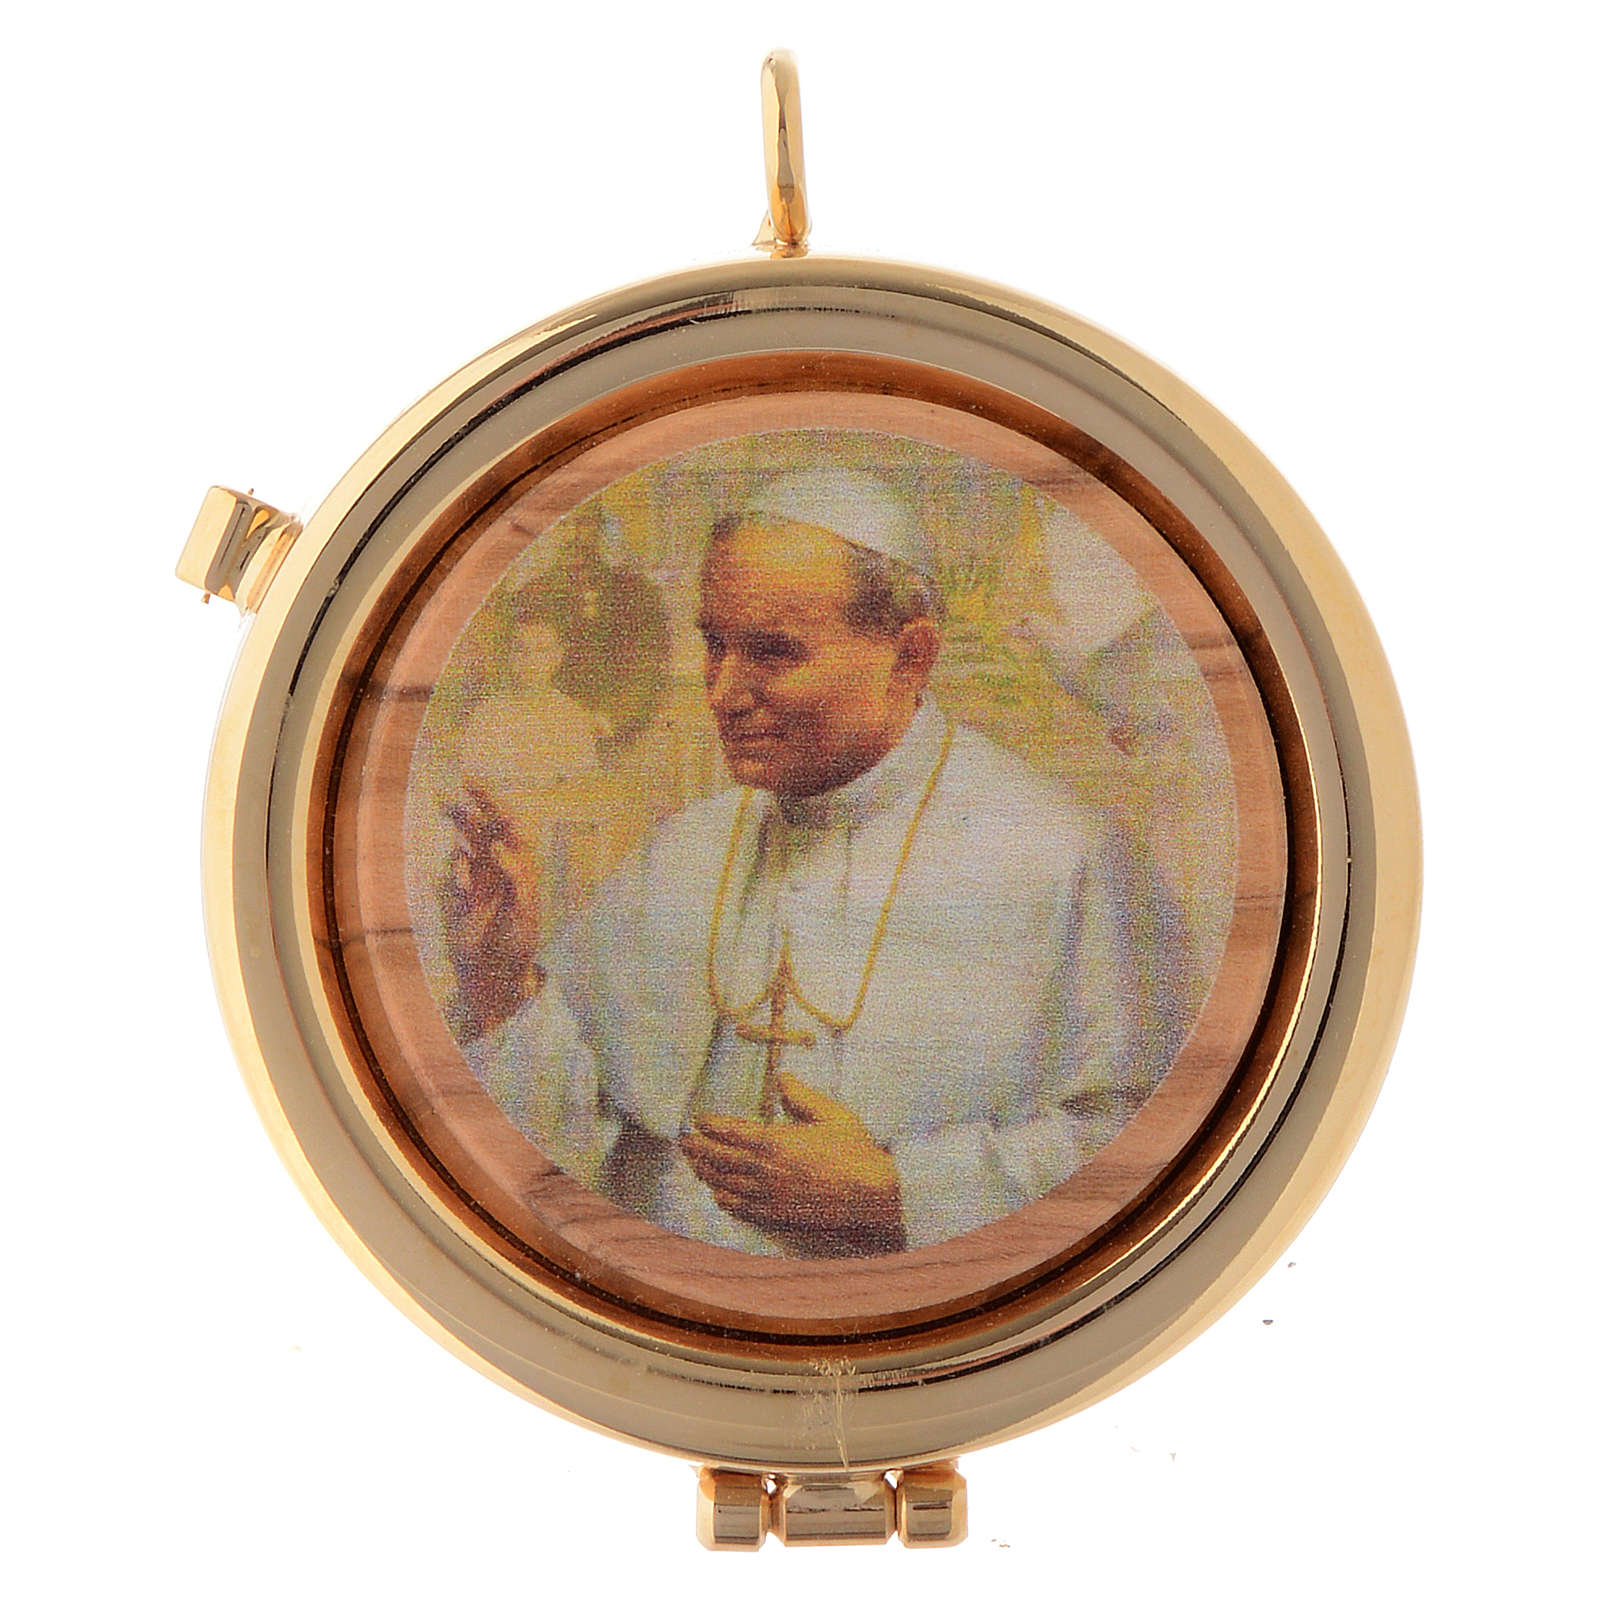 Teca placca ulivo papa Giovanni Paolo II diam. 6 cm 3